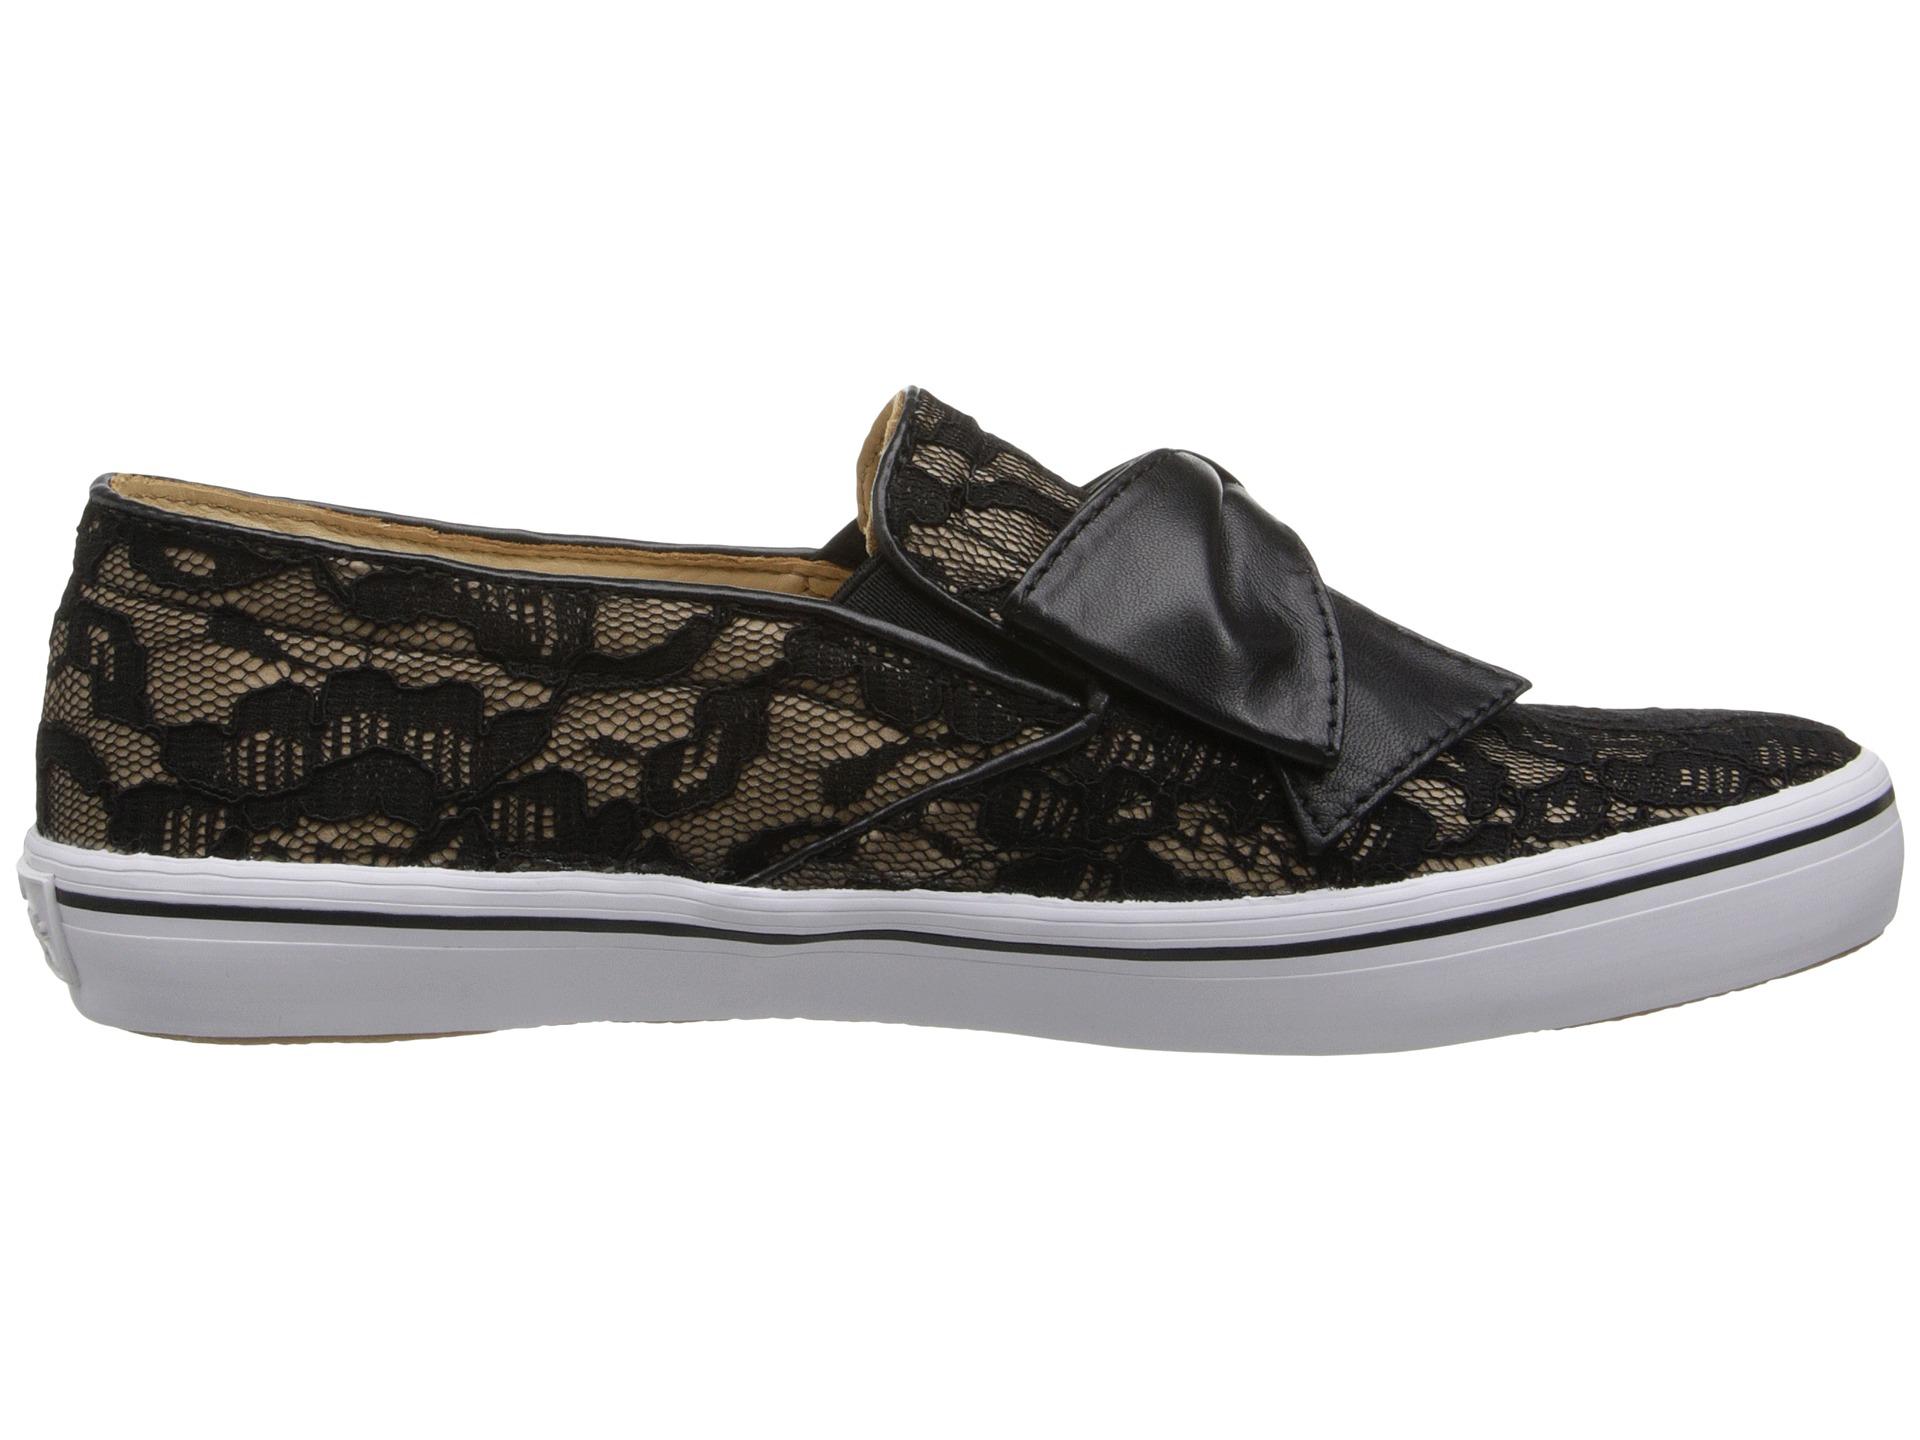 961ed5602048 Lyst - Kate Spade Delise Lace Bow Slip-On Sneaker in Black